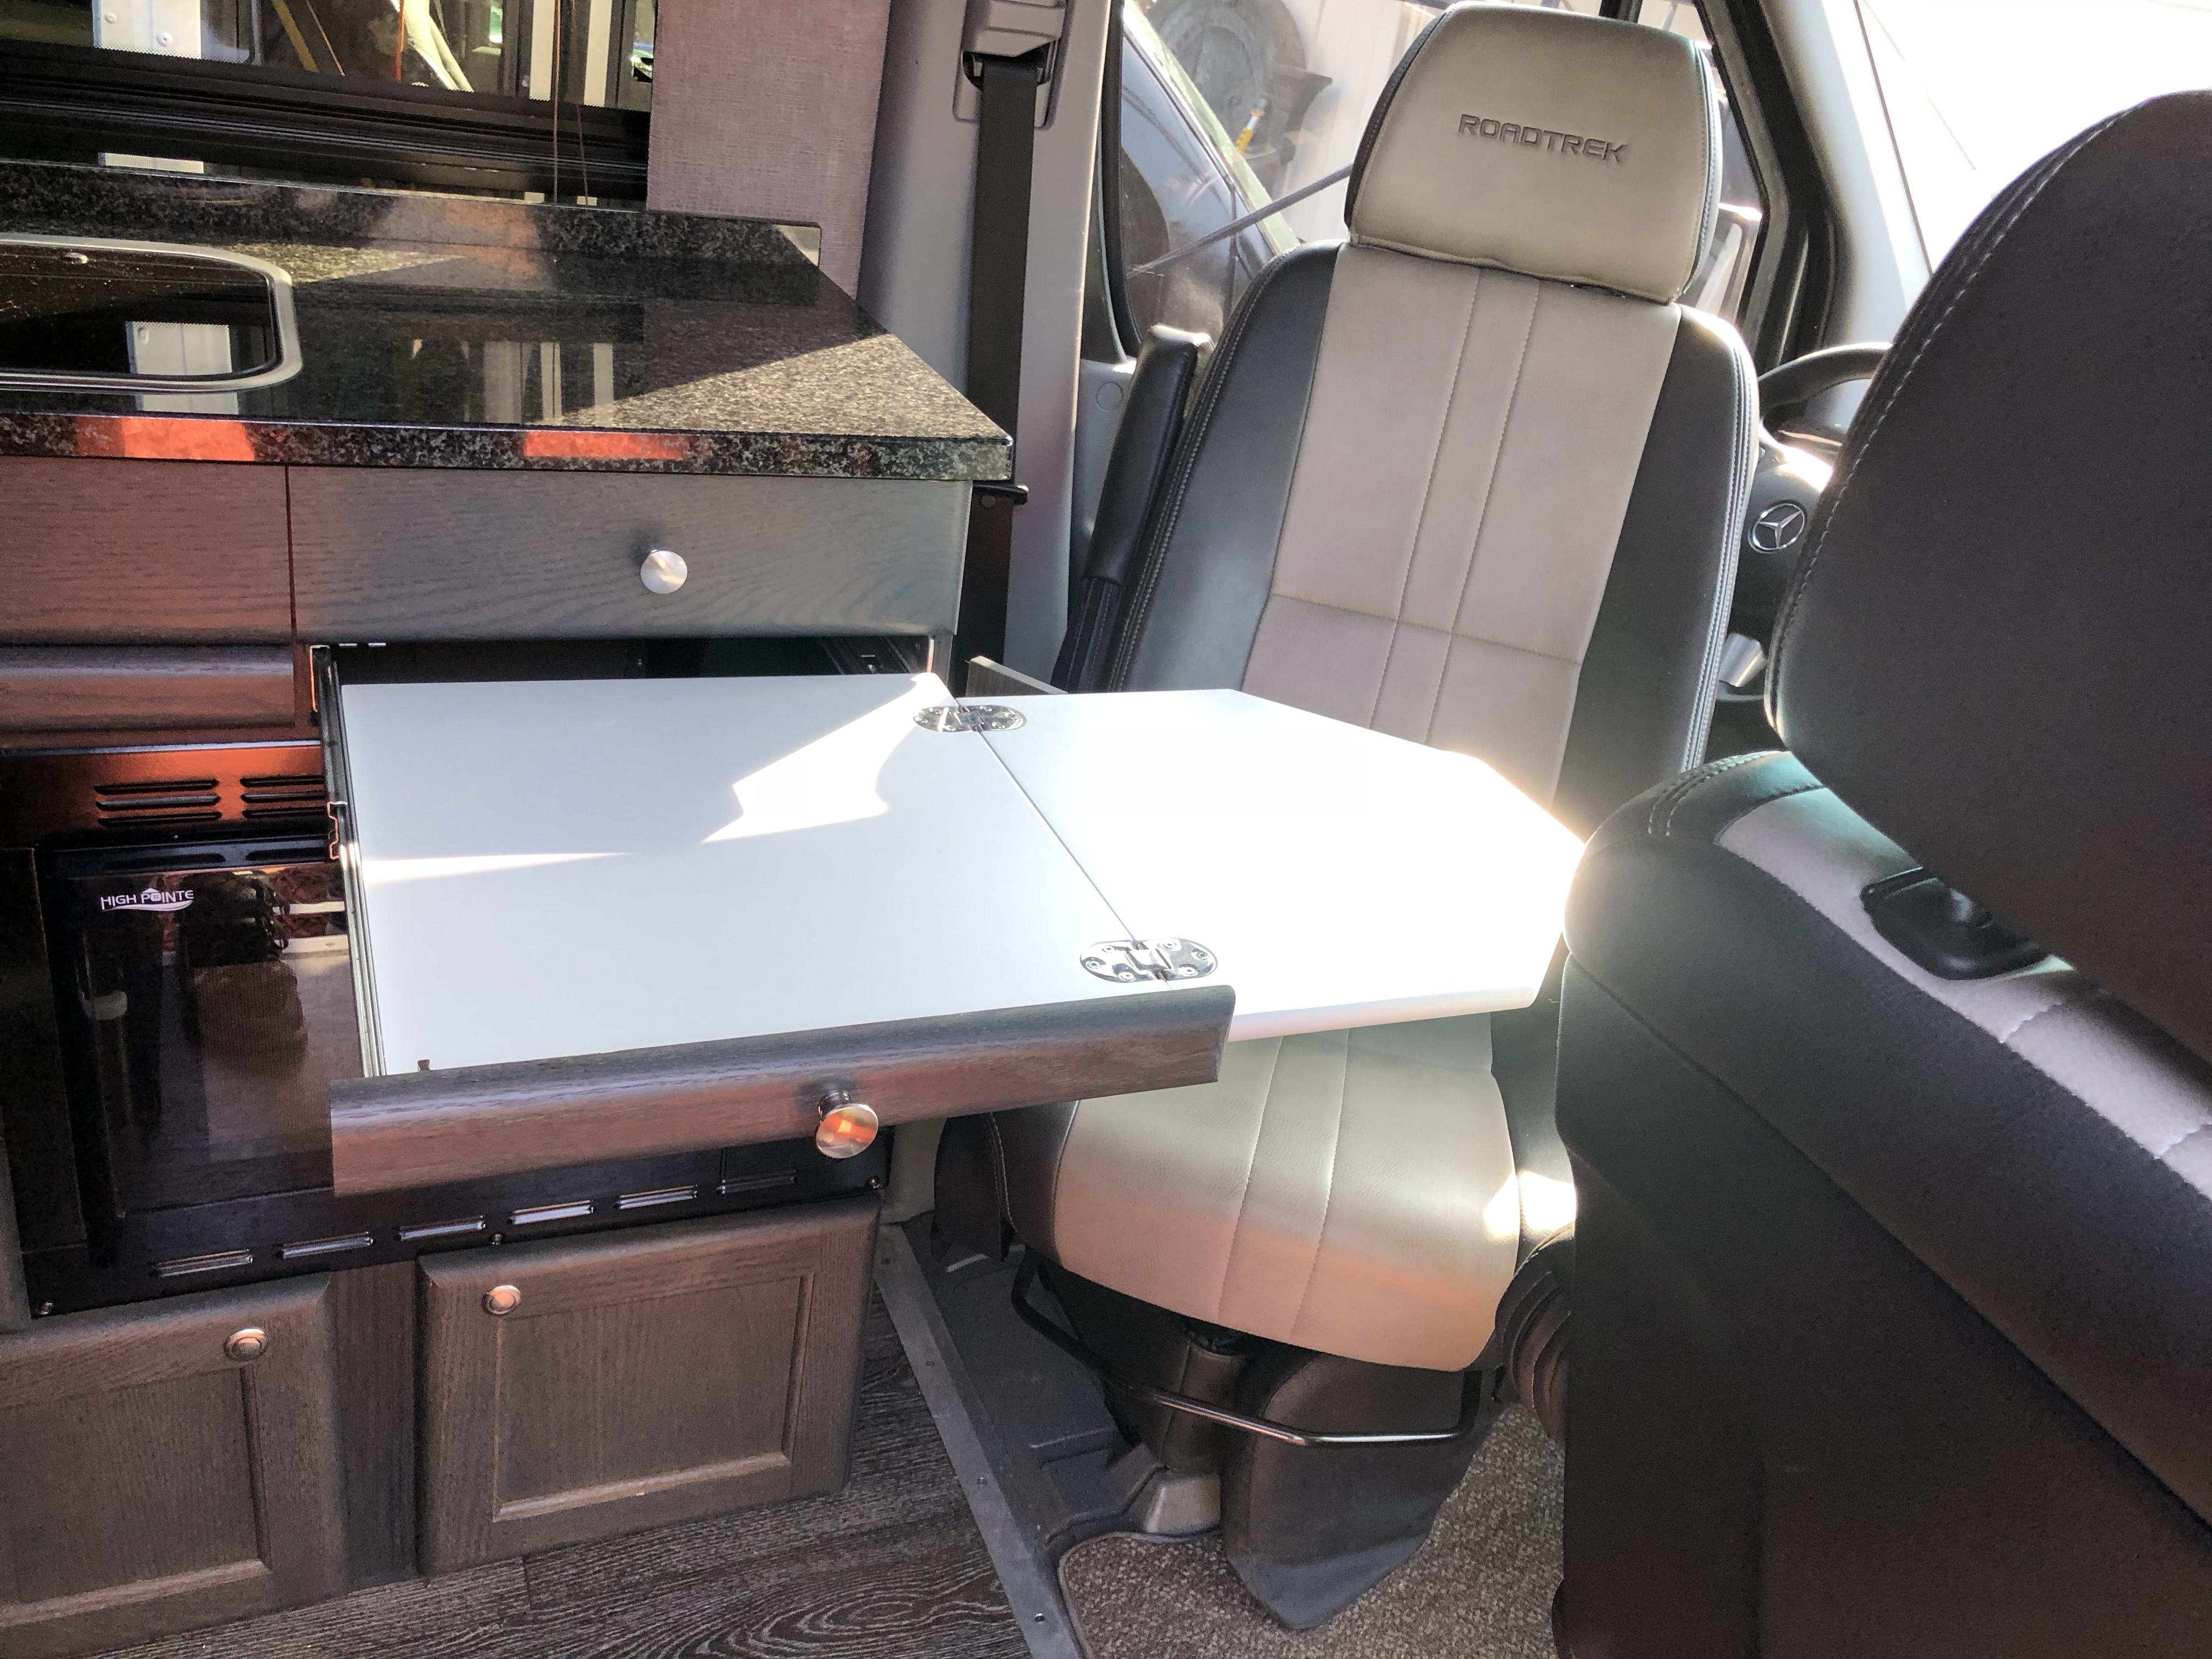 Driver's seat swiveled to pop out desk.. Mercedes Roadtrek SS Agile 2015